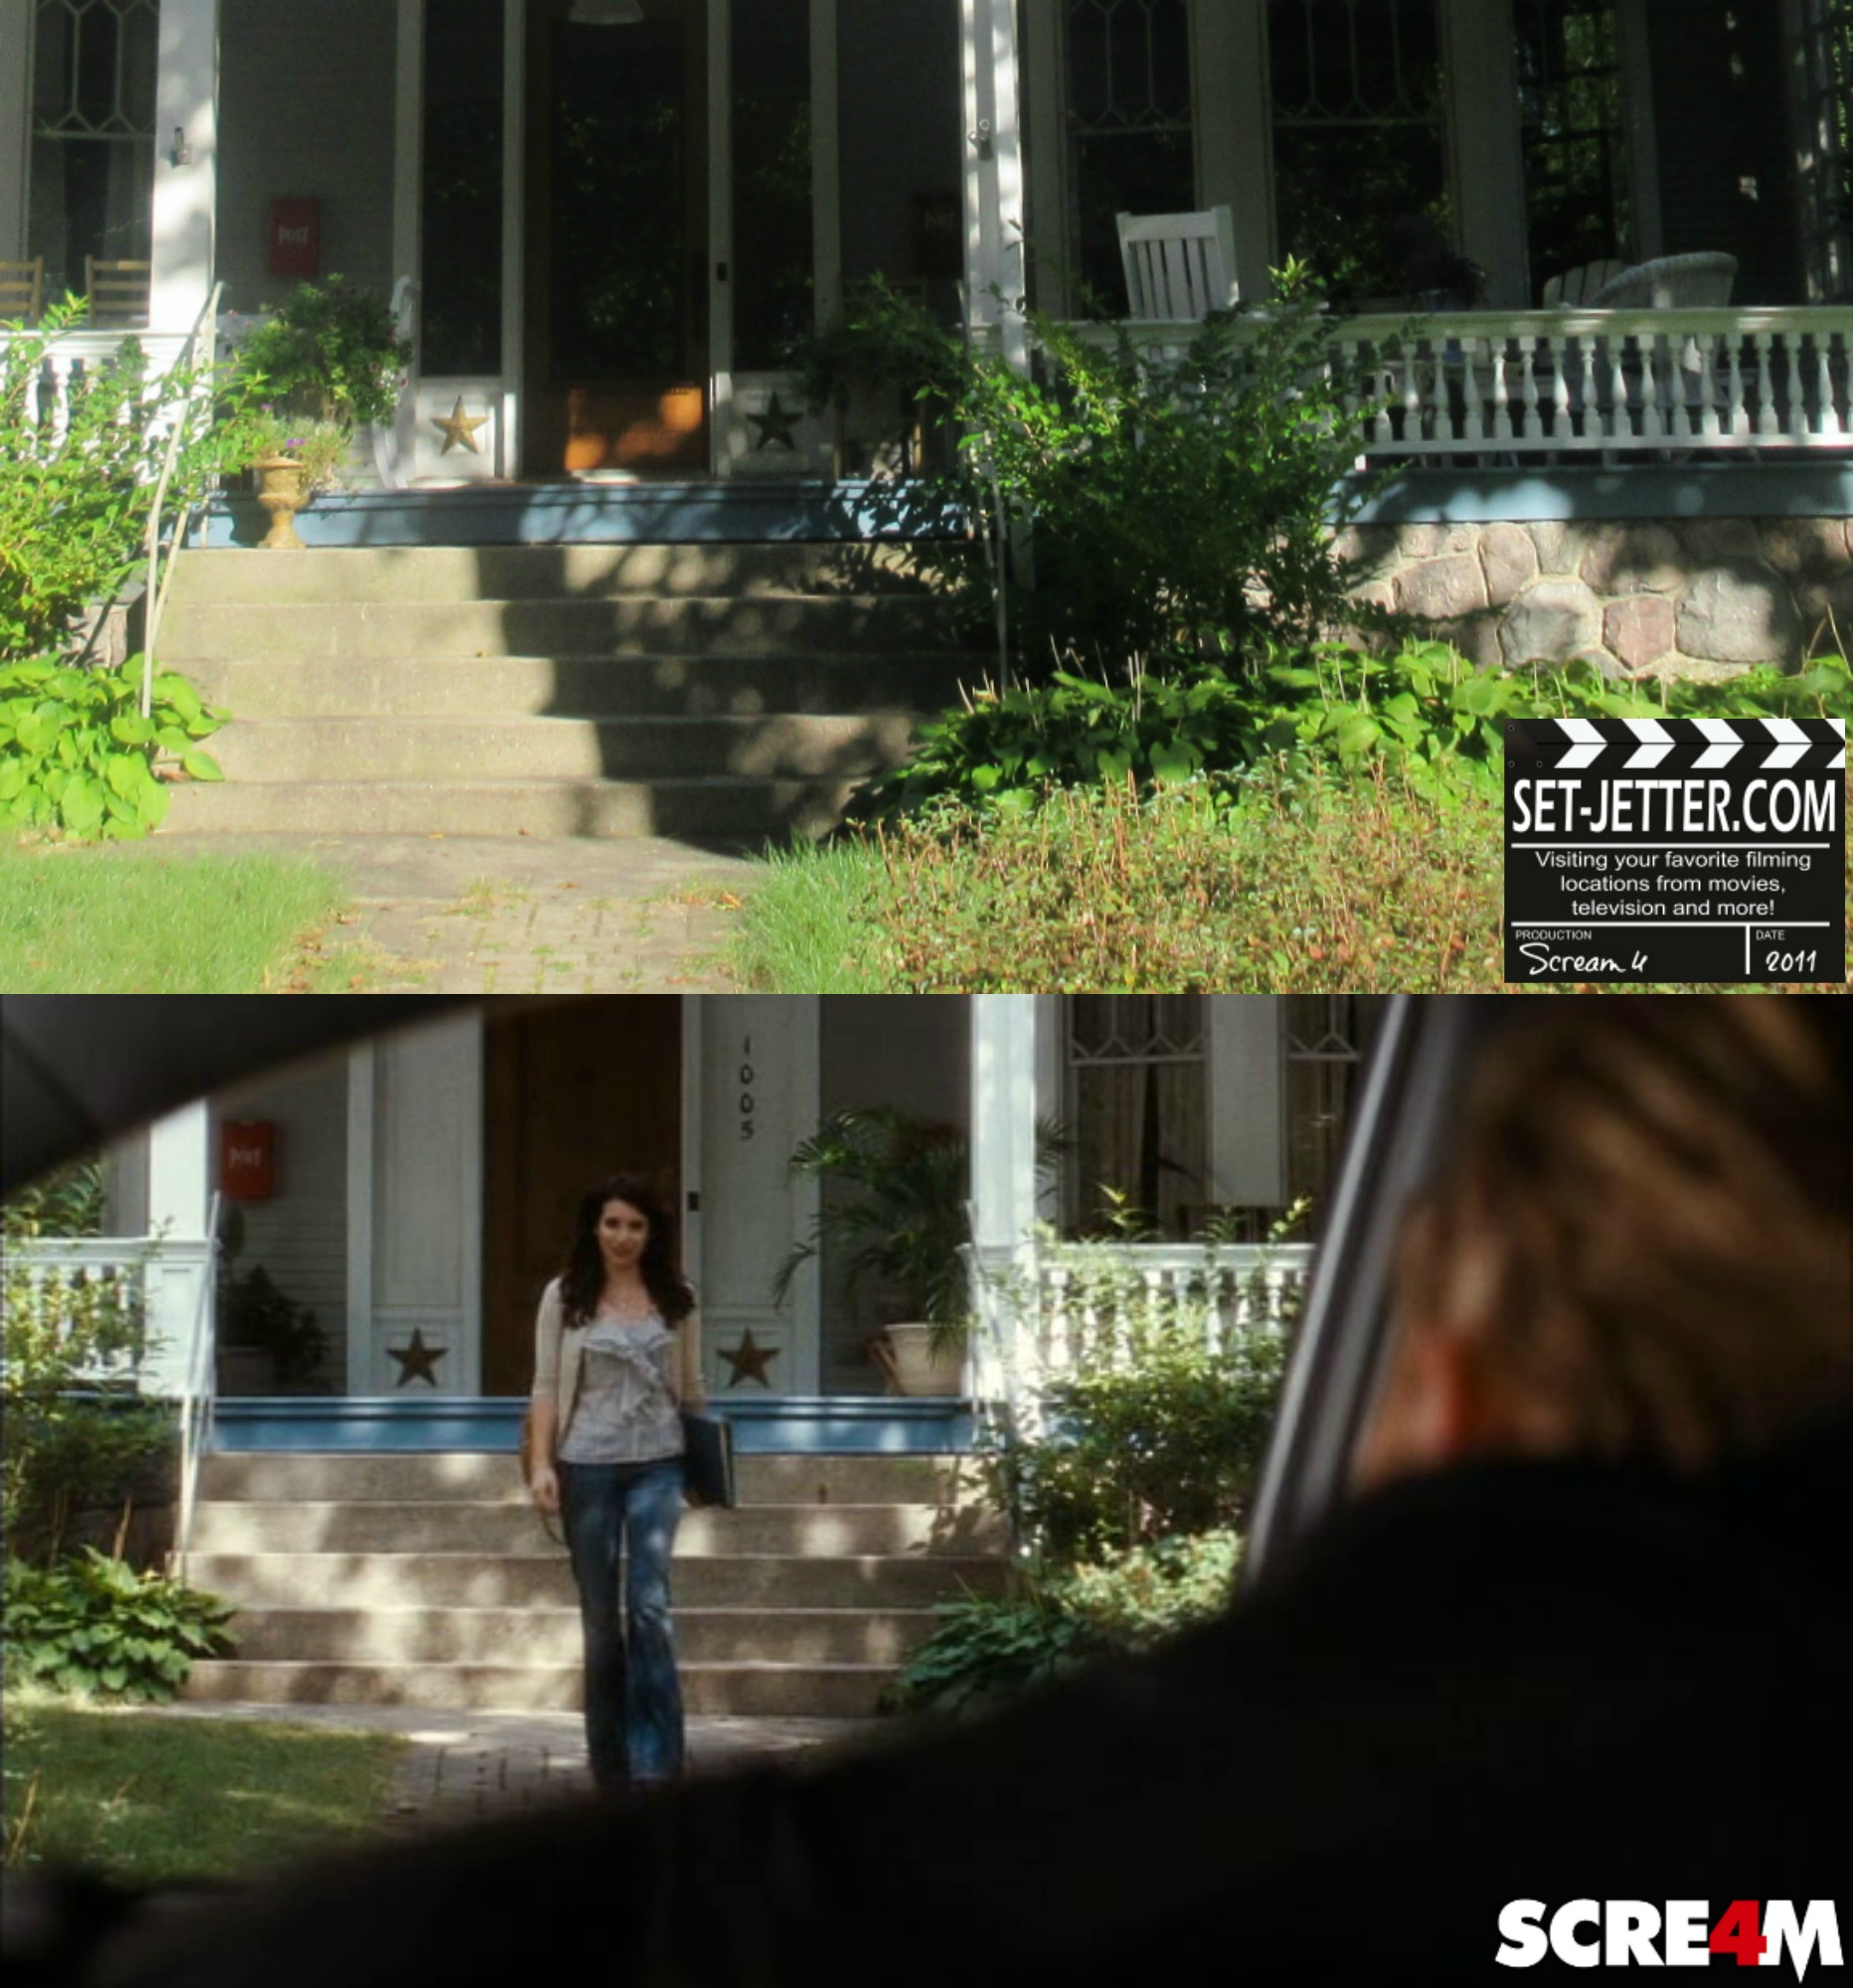 Scream4 comparison 34.jpg